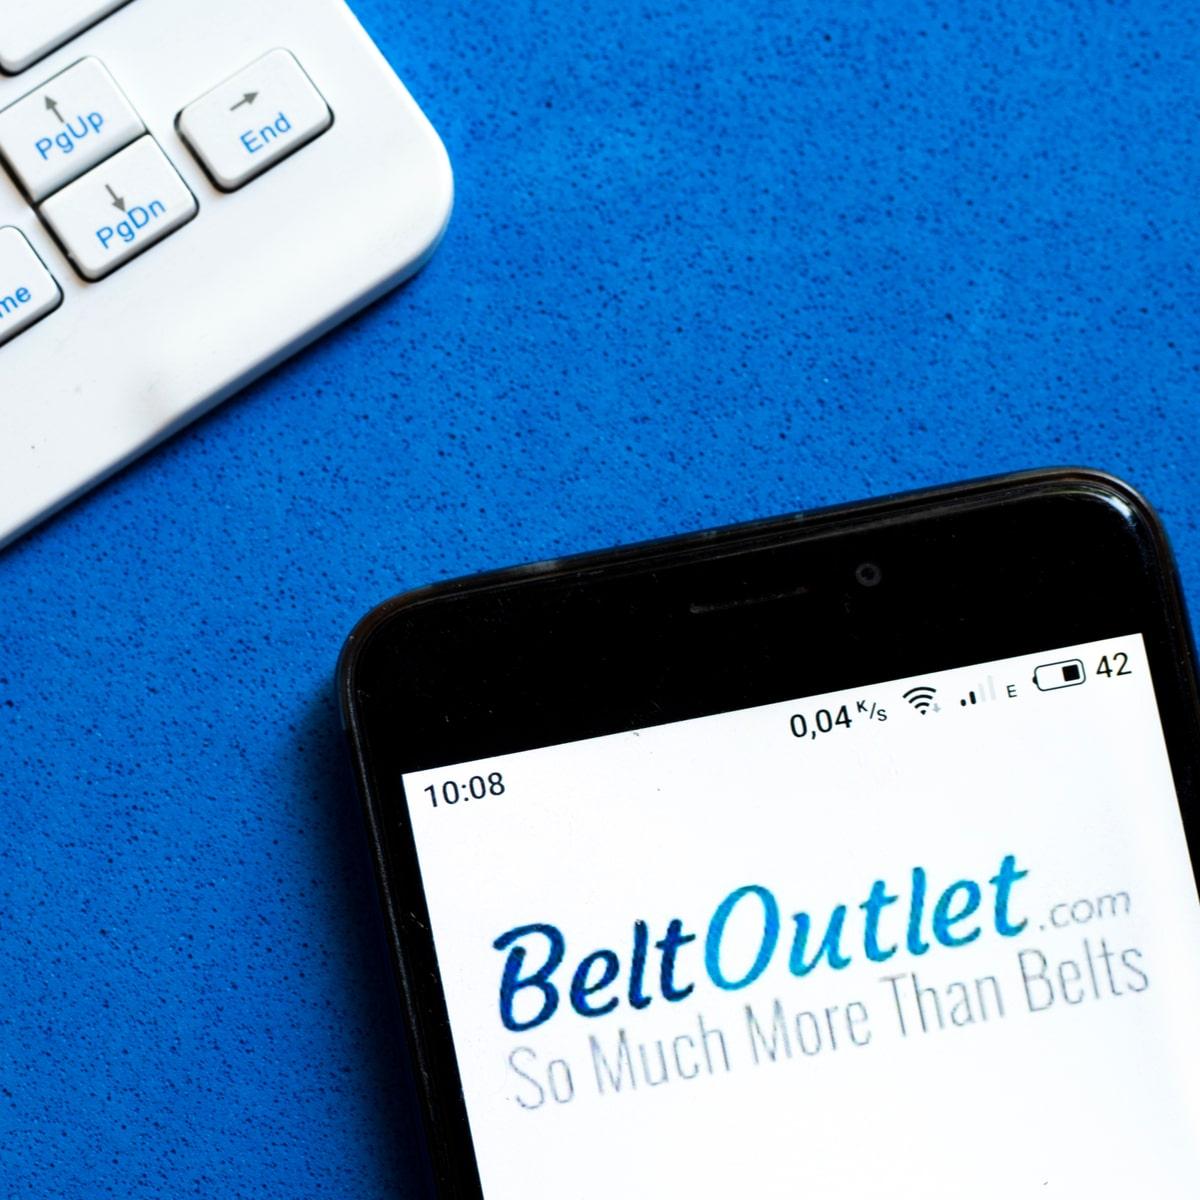 BeltOutlet Cell Phone